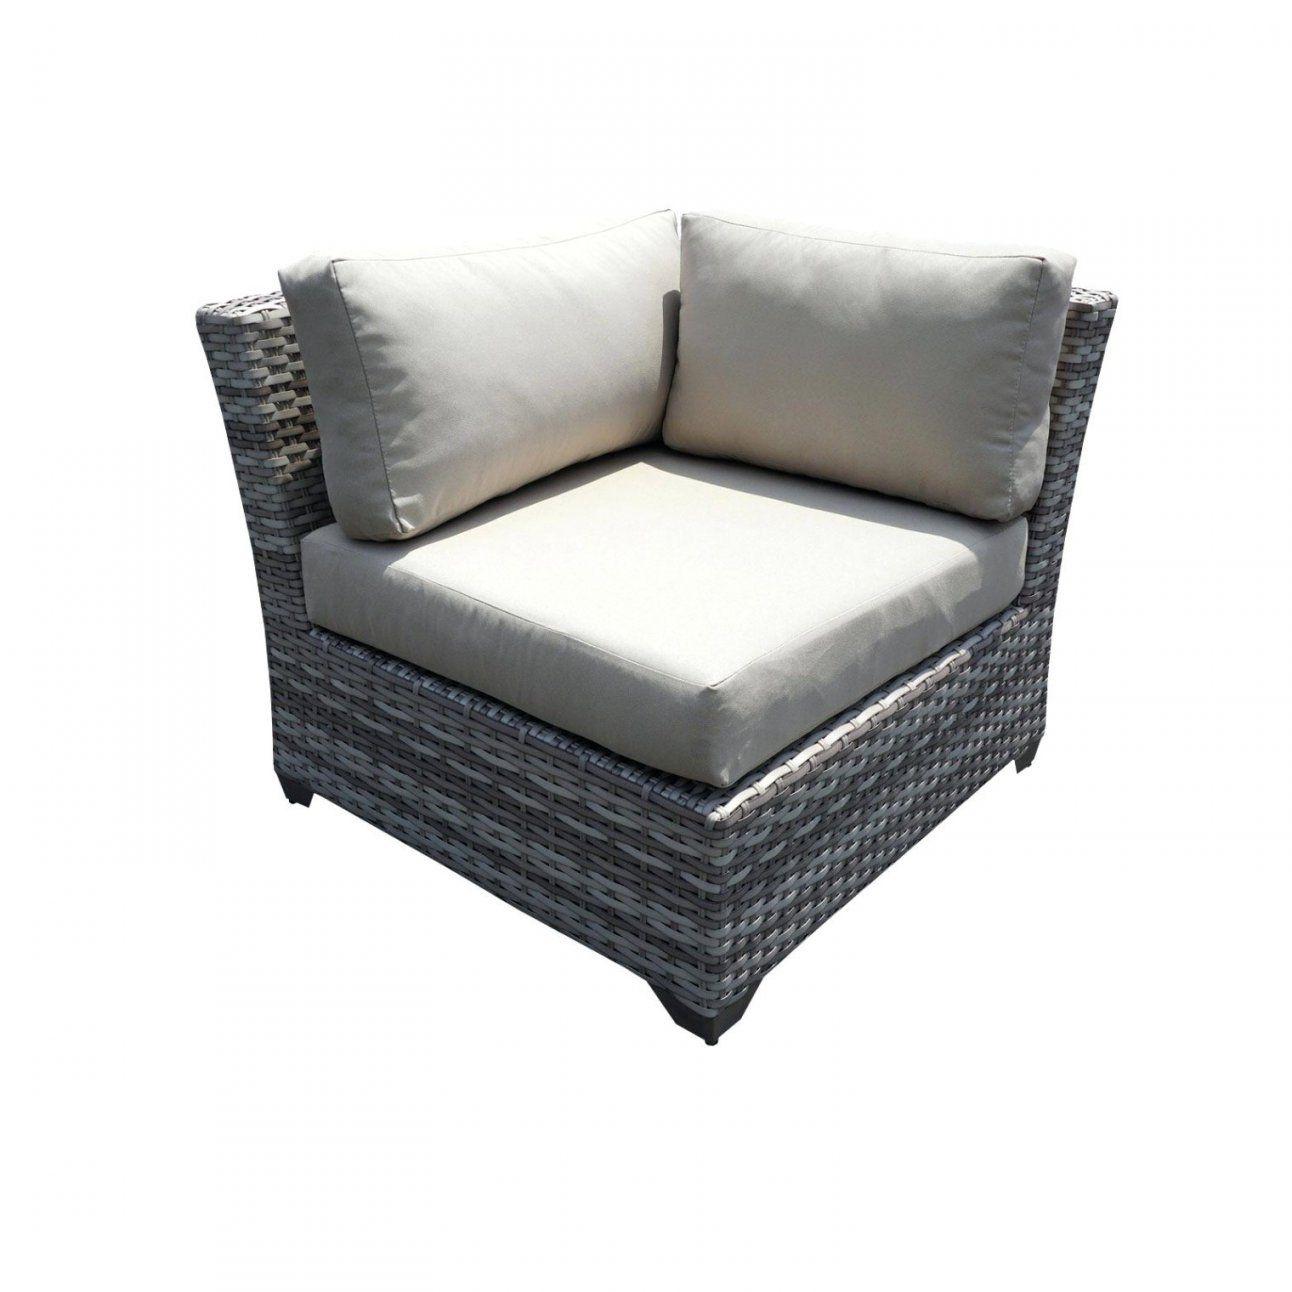 Lounge Sessel Guenstig Outdoor Patio Lounge Chairs Beautiful von Lounge Sessel Outdoor Günstig Photo